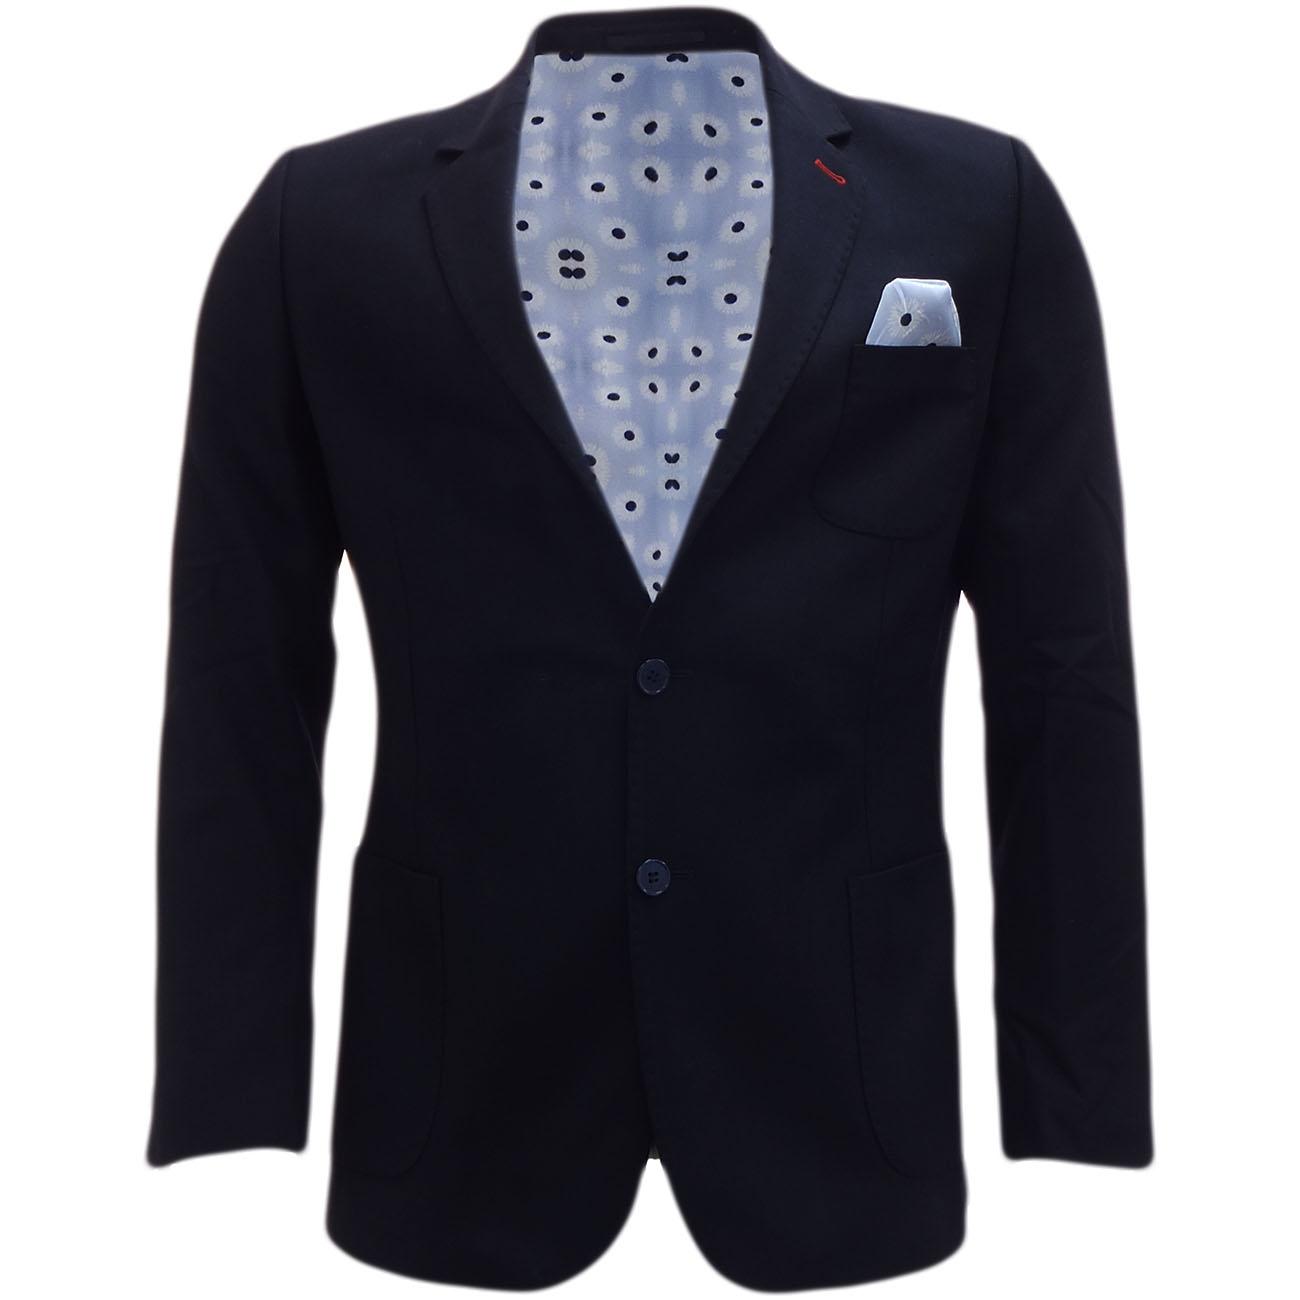 Bewley Ritch Suit Jacket Blazer Coat Smart Navy with Pocket Square